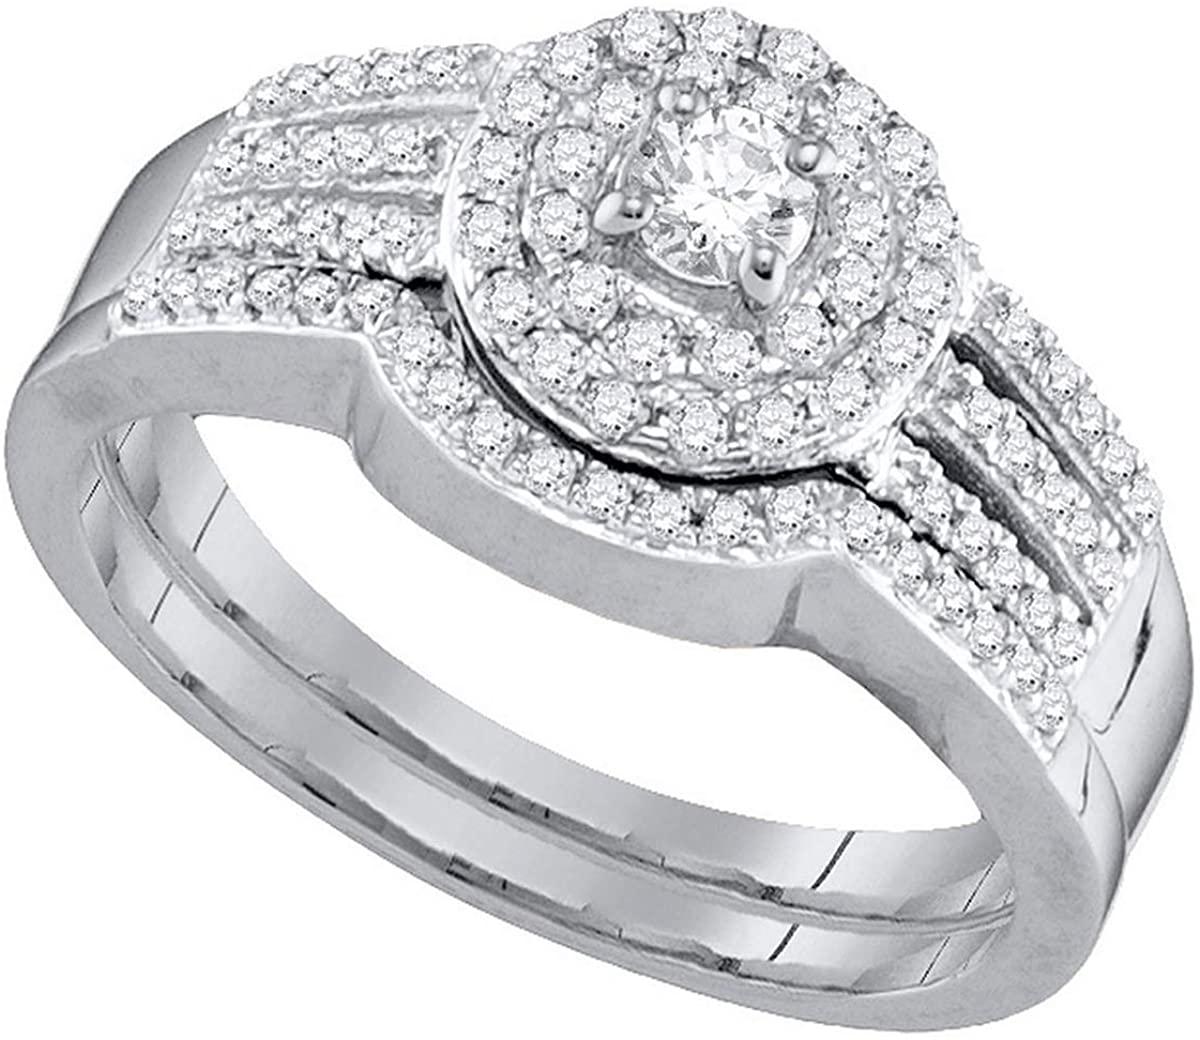 Dazzlingrock Collection 0.48 Carat (ctw) Round Diamond Strand Halo Bridal Wedding Ring Set 1/2 CT, 10K White Gold